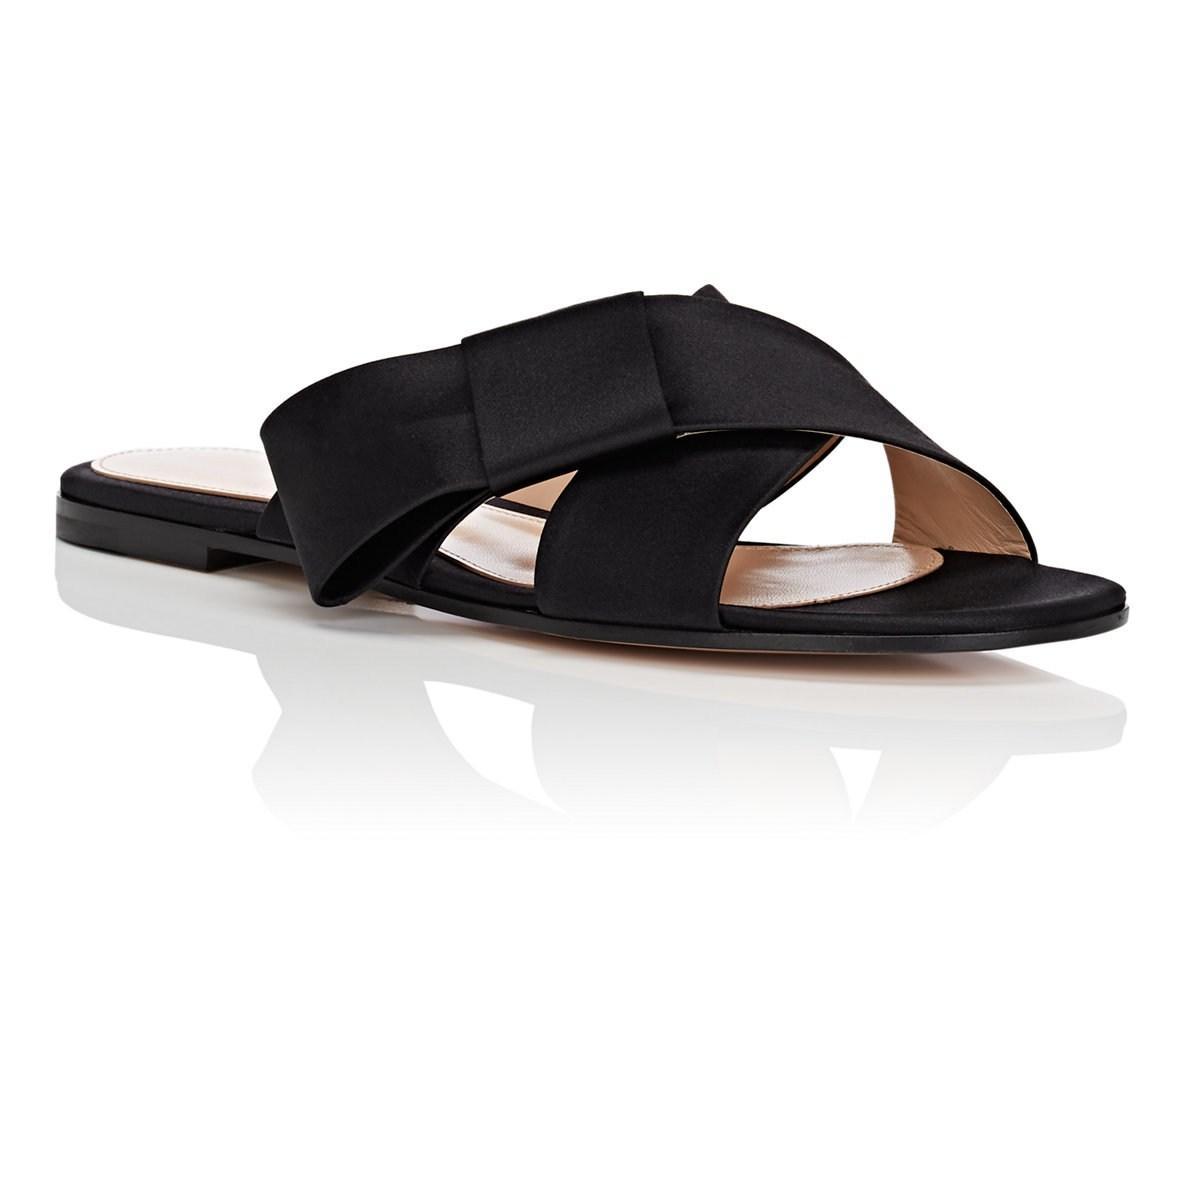 448e9c3bb Lyst - Gianvito Rossi Obi Bow-detailed Satin Sandals in Black